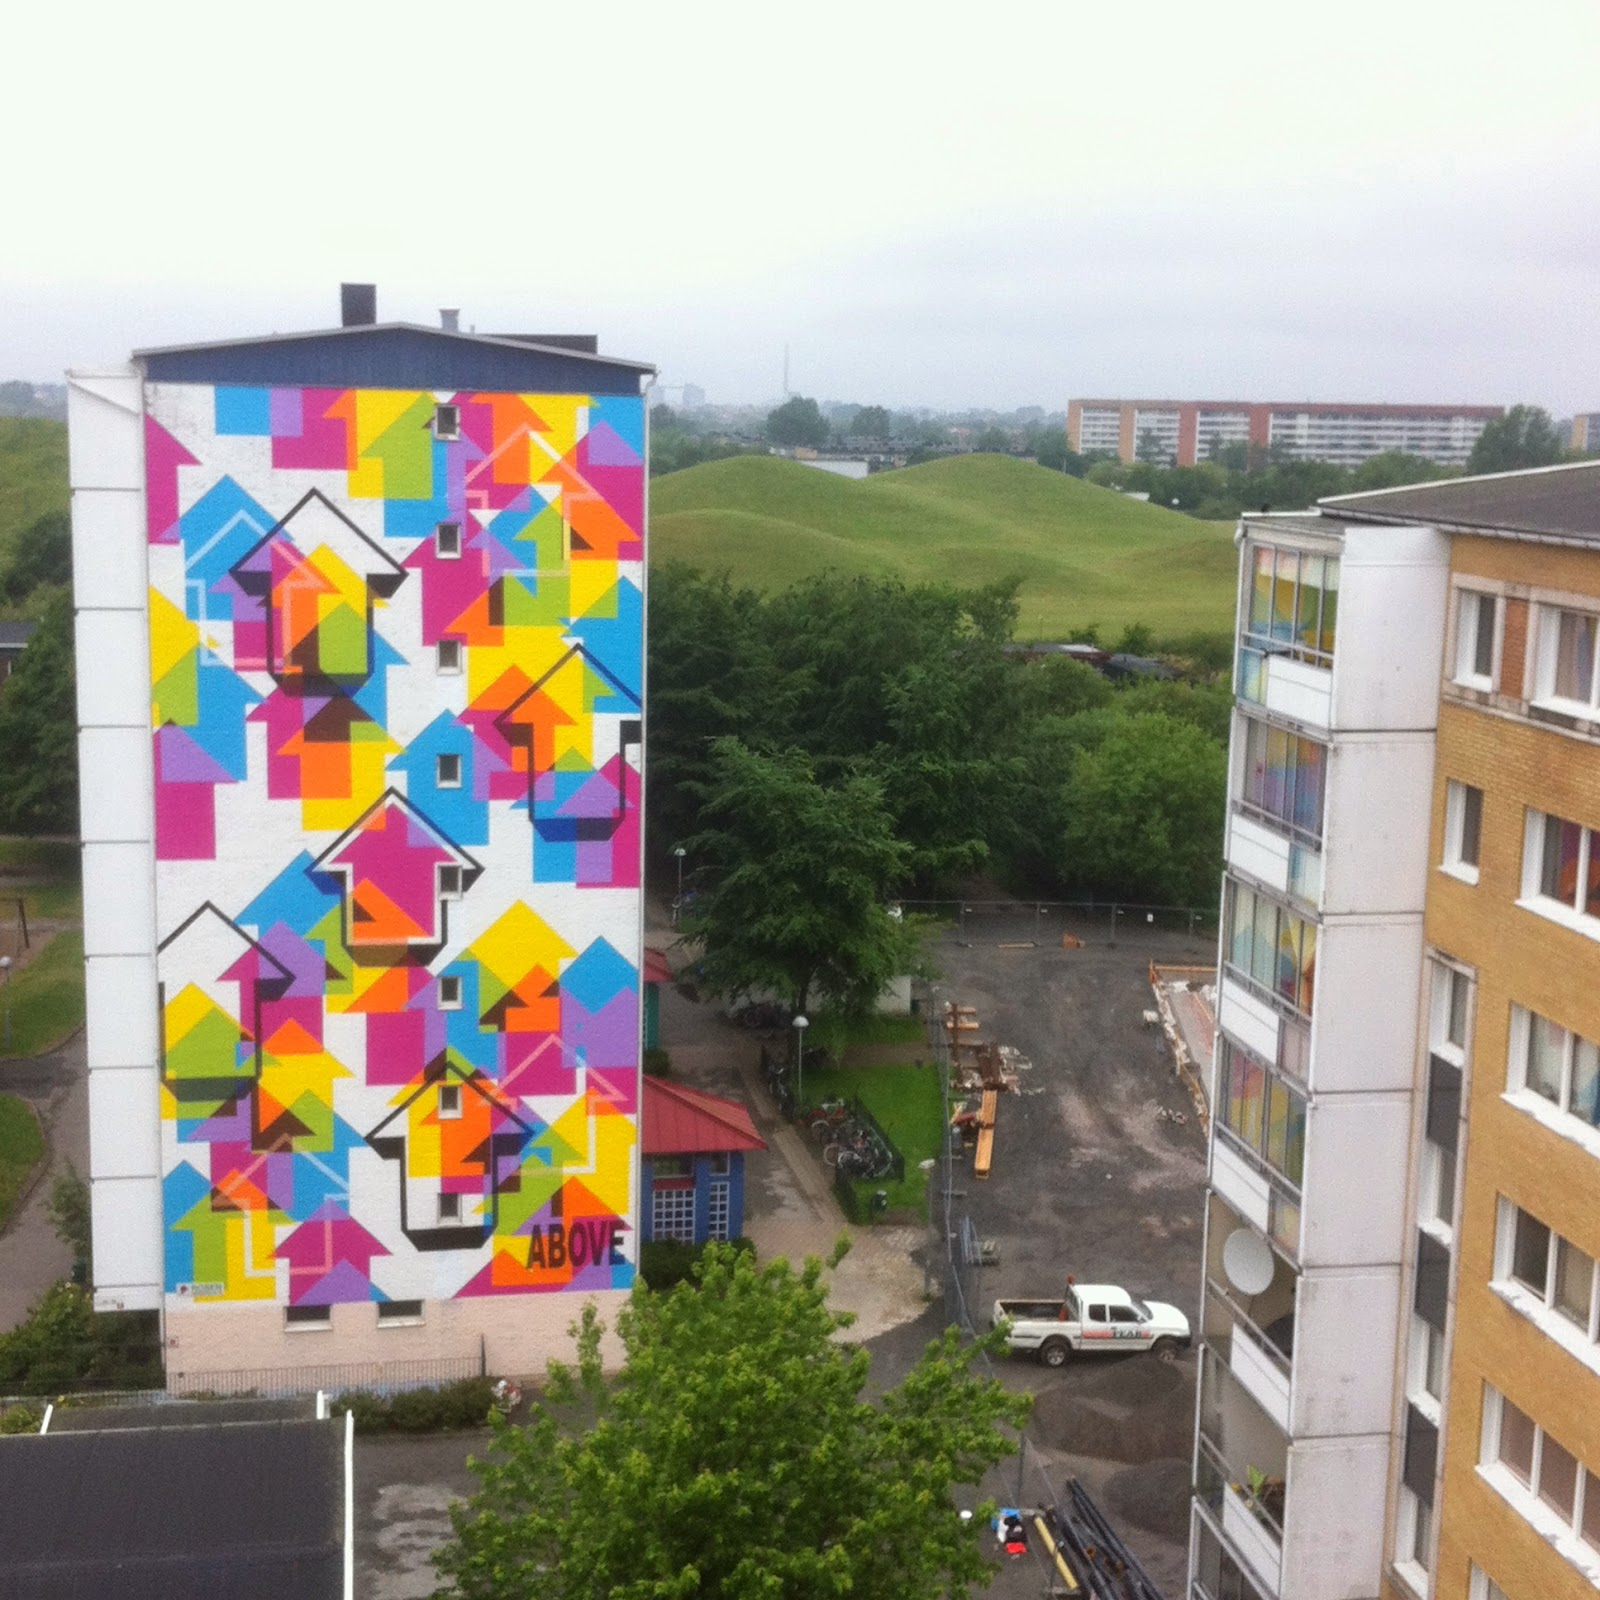 Above New Mural For ArtScape Festival – Malmo, Sweden